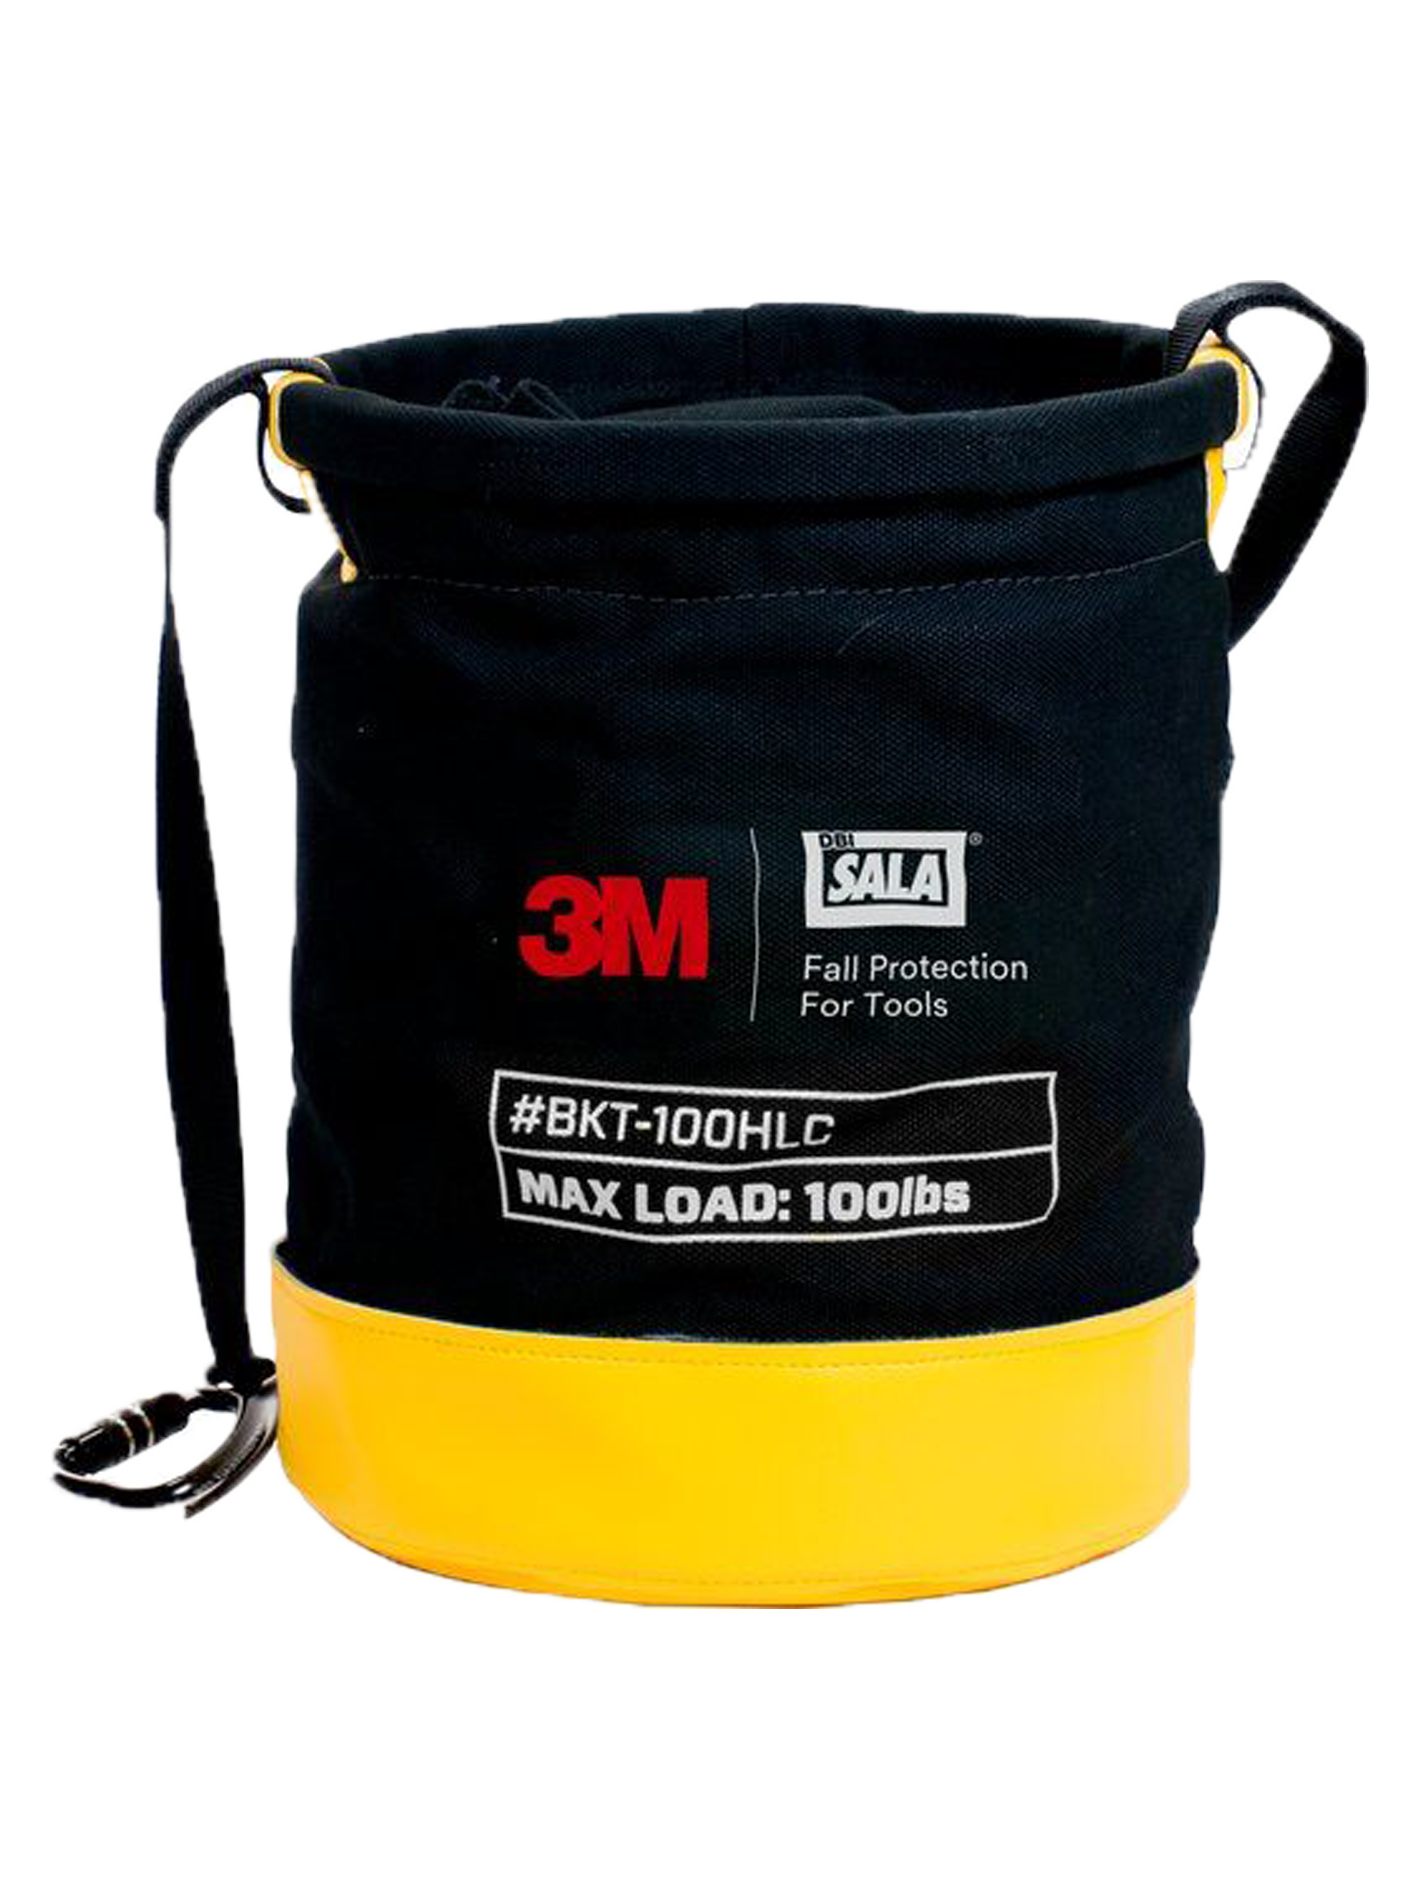 3M™ DBI-SALA® Safe Buckets